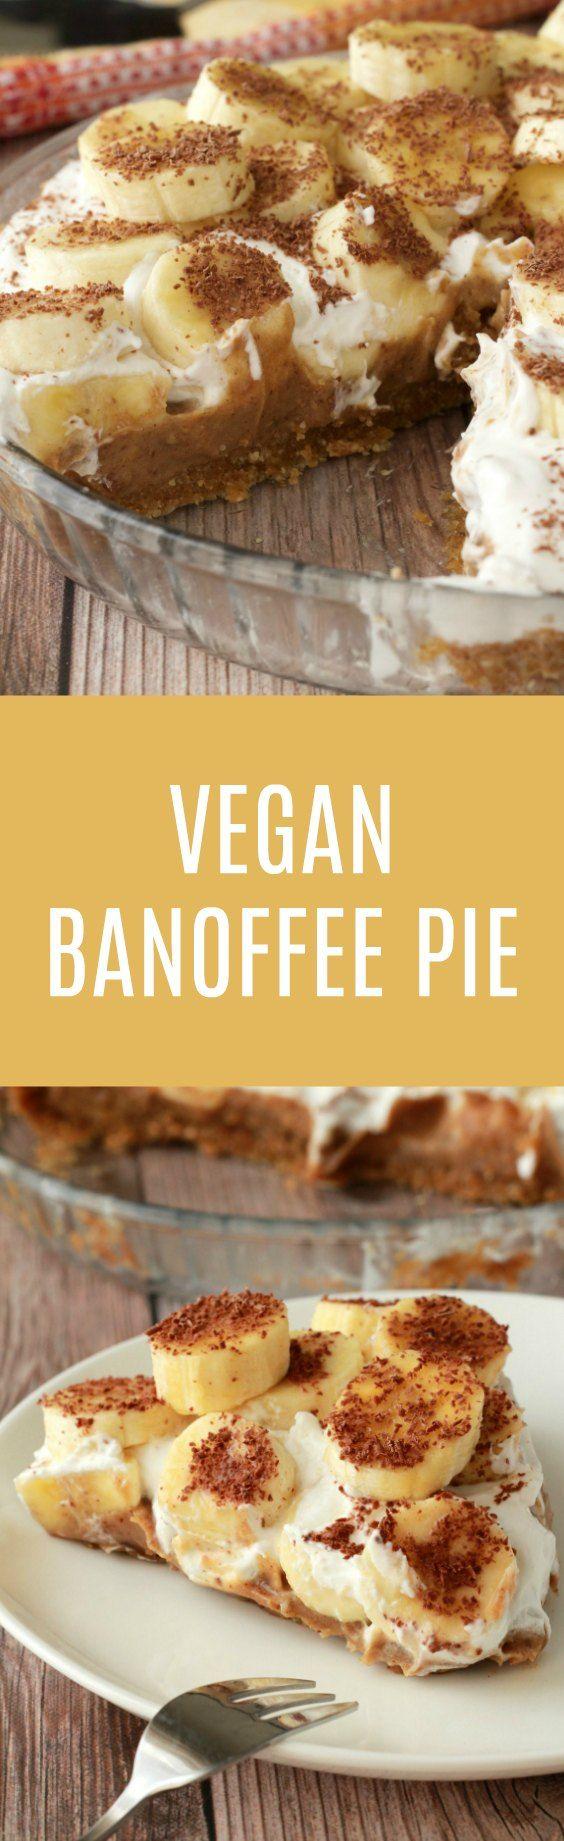 Vegan Banoffee Pie. Insanely delicious, raw and gluten-free! Vegan | Raw Vegan | Vegan Dessert | Vegan Recipes | Gluten Free | Gluten Free Vegan | Dairy Free